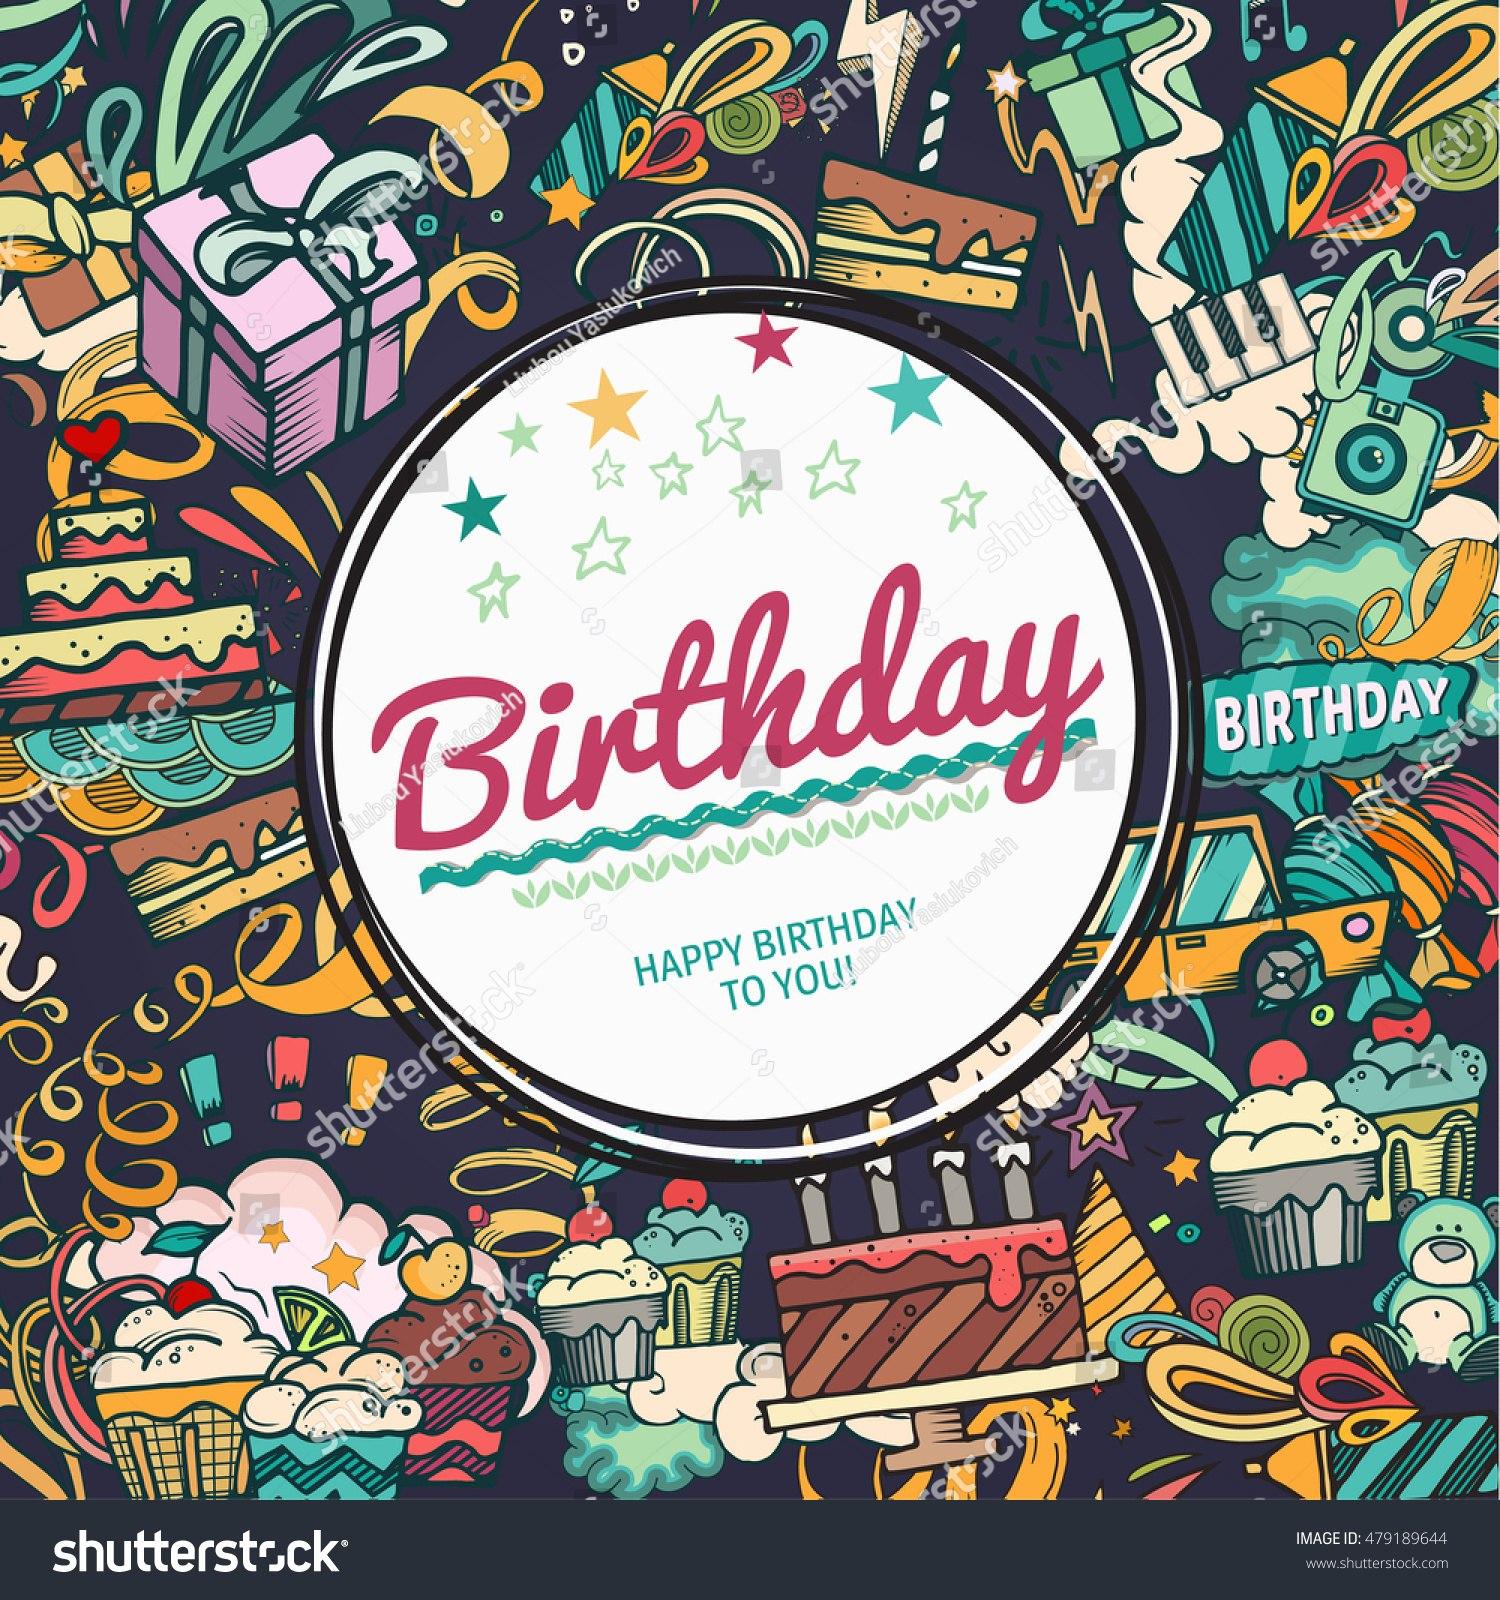 Birthday Background Collage Photo Frame Card Stockvektorgrafik Pertaining To Birthday Card Collage Template